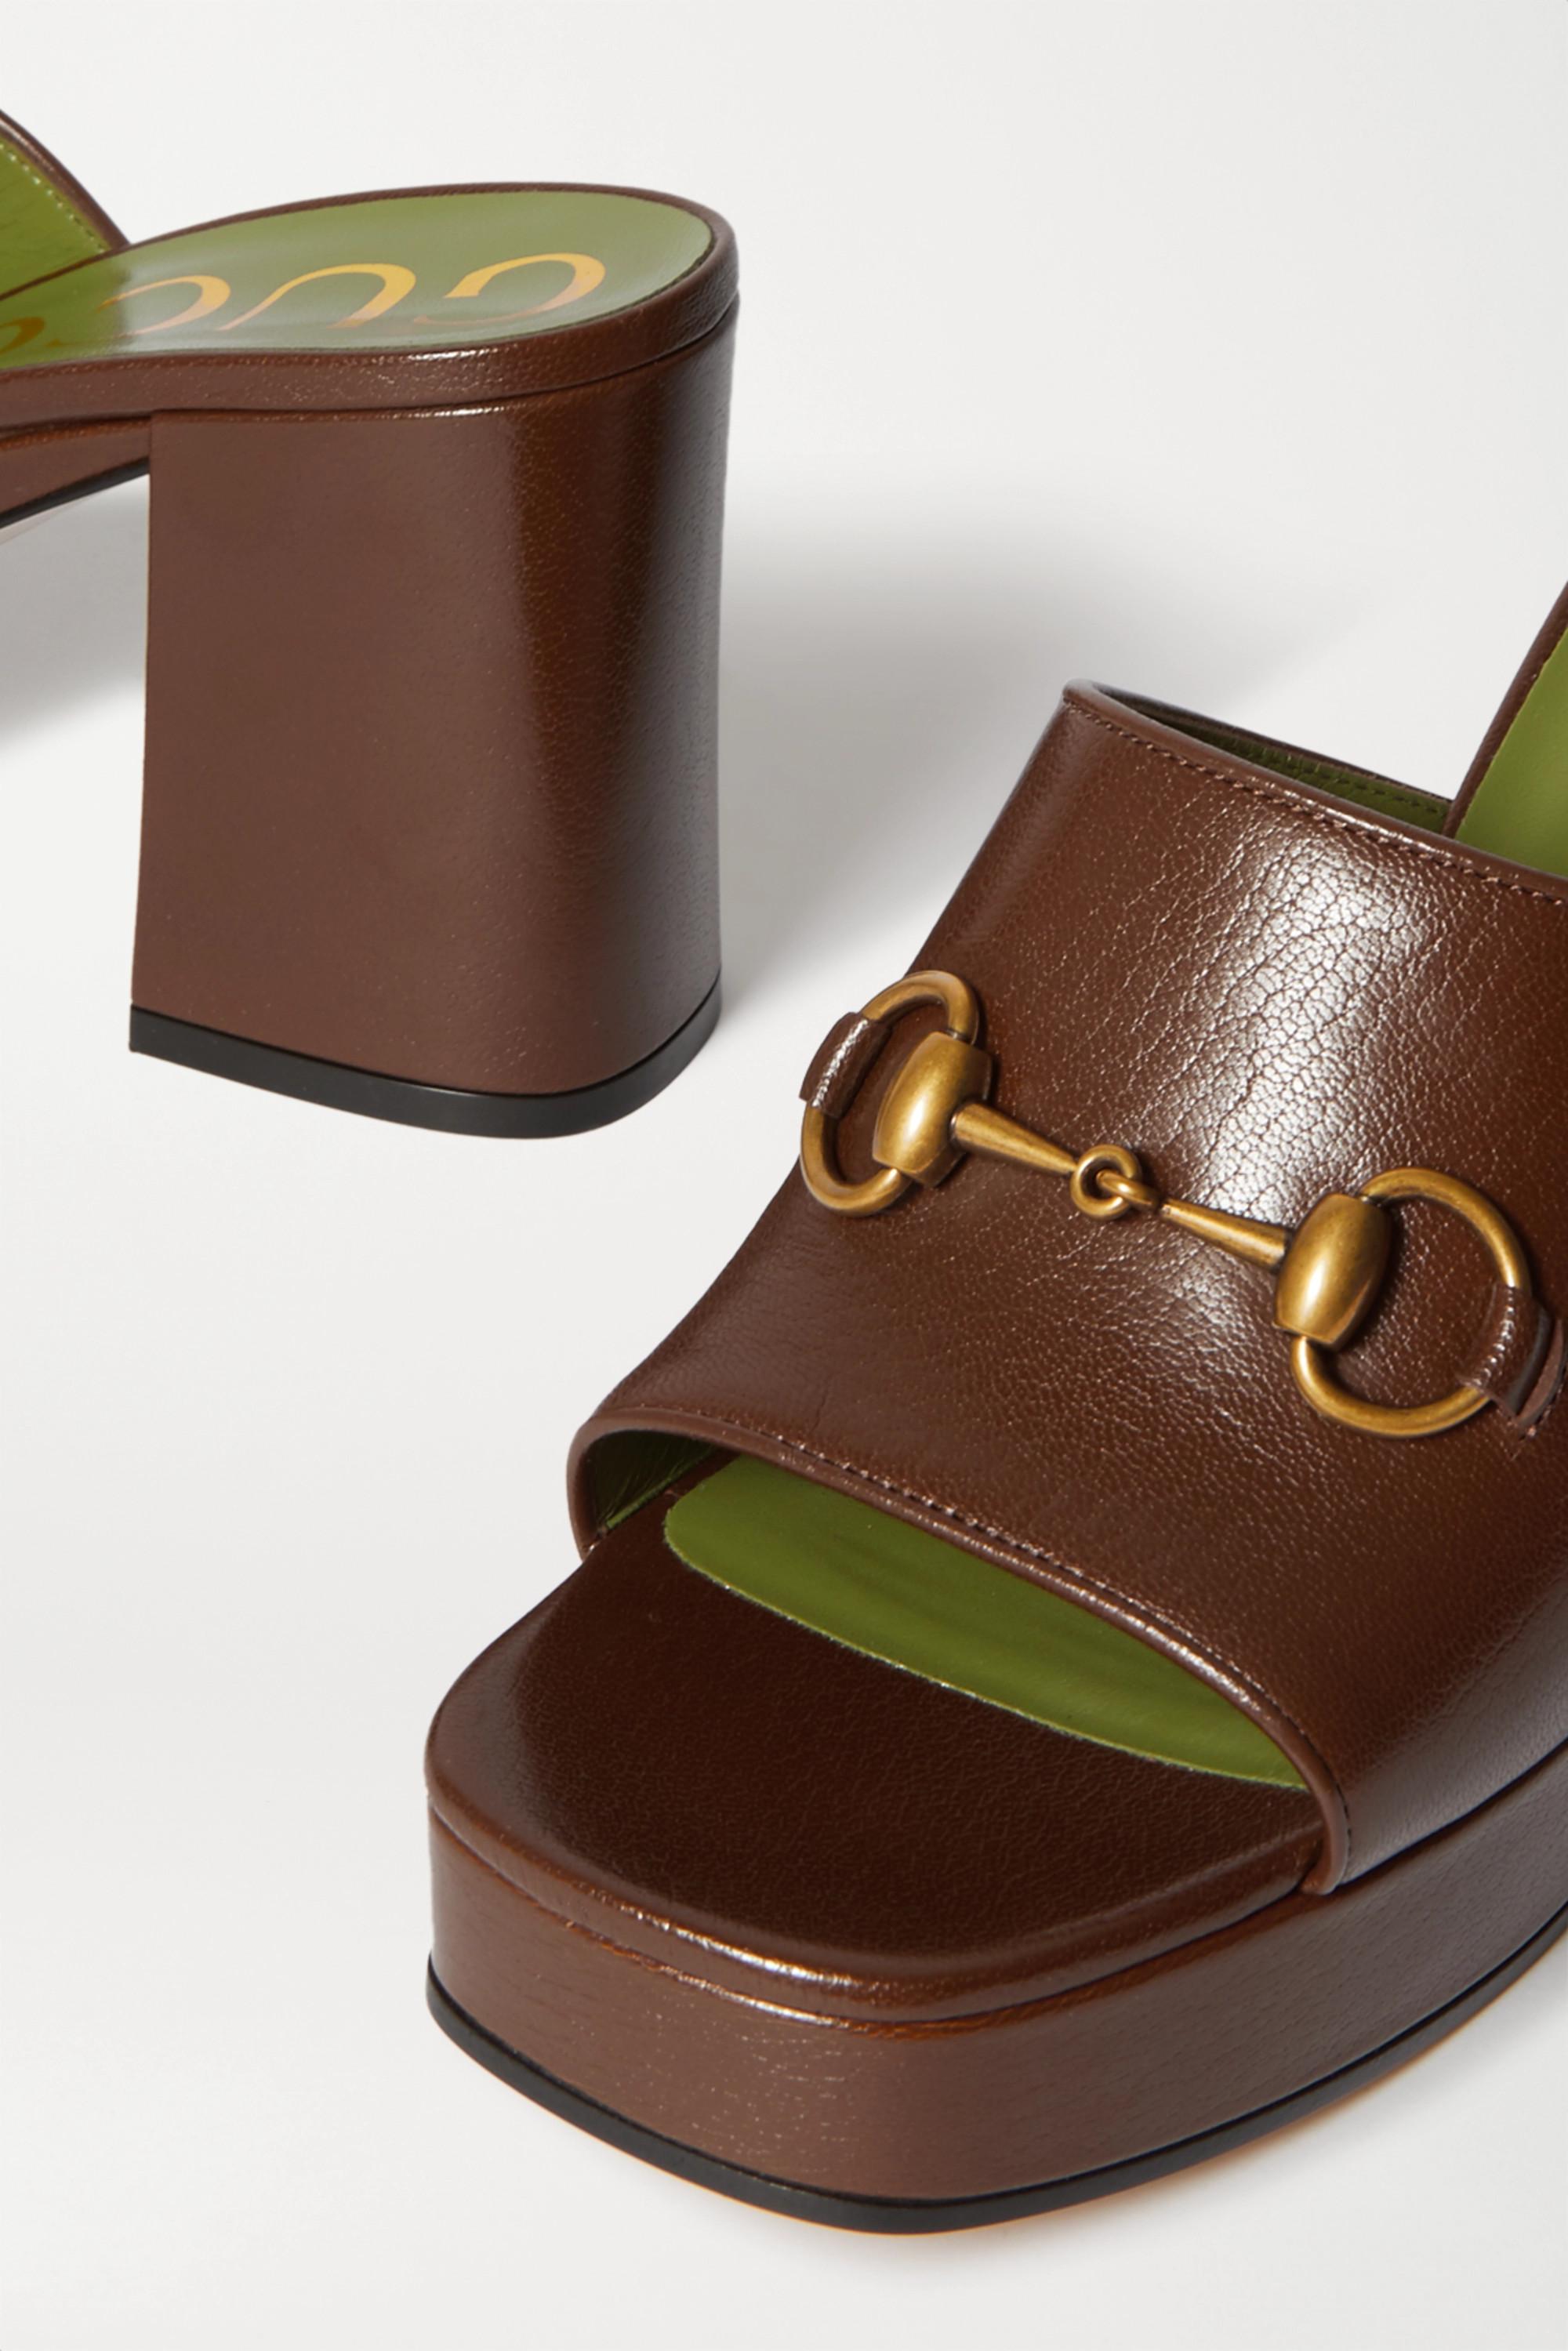 Gucci Houdan horsebit-detailed leather platform mules